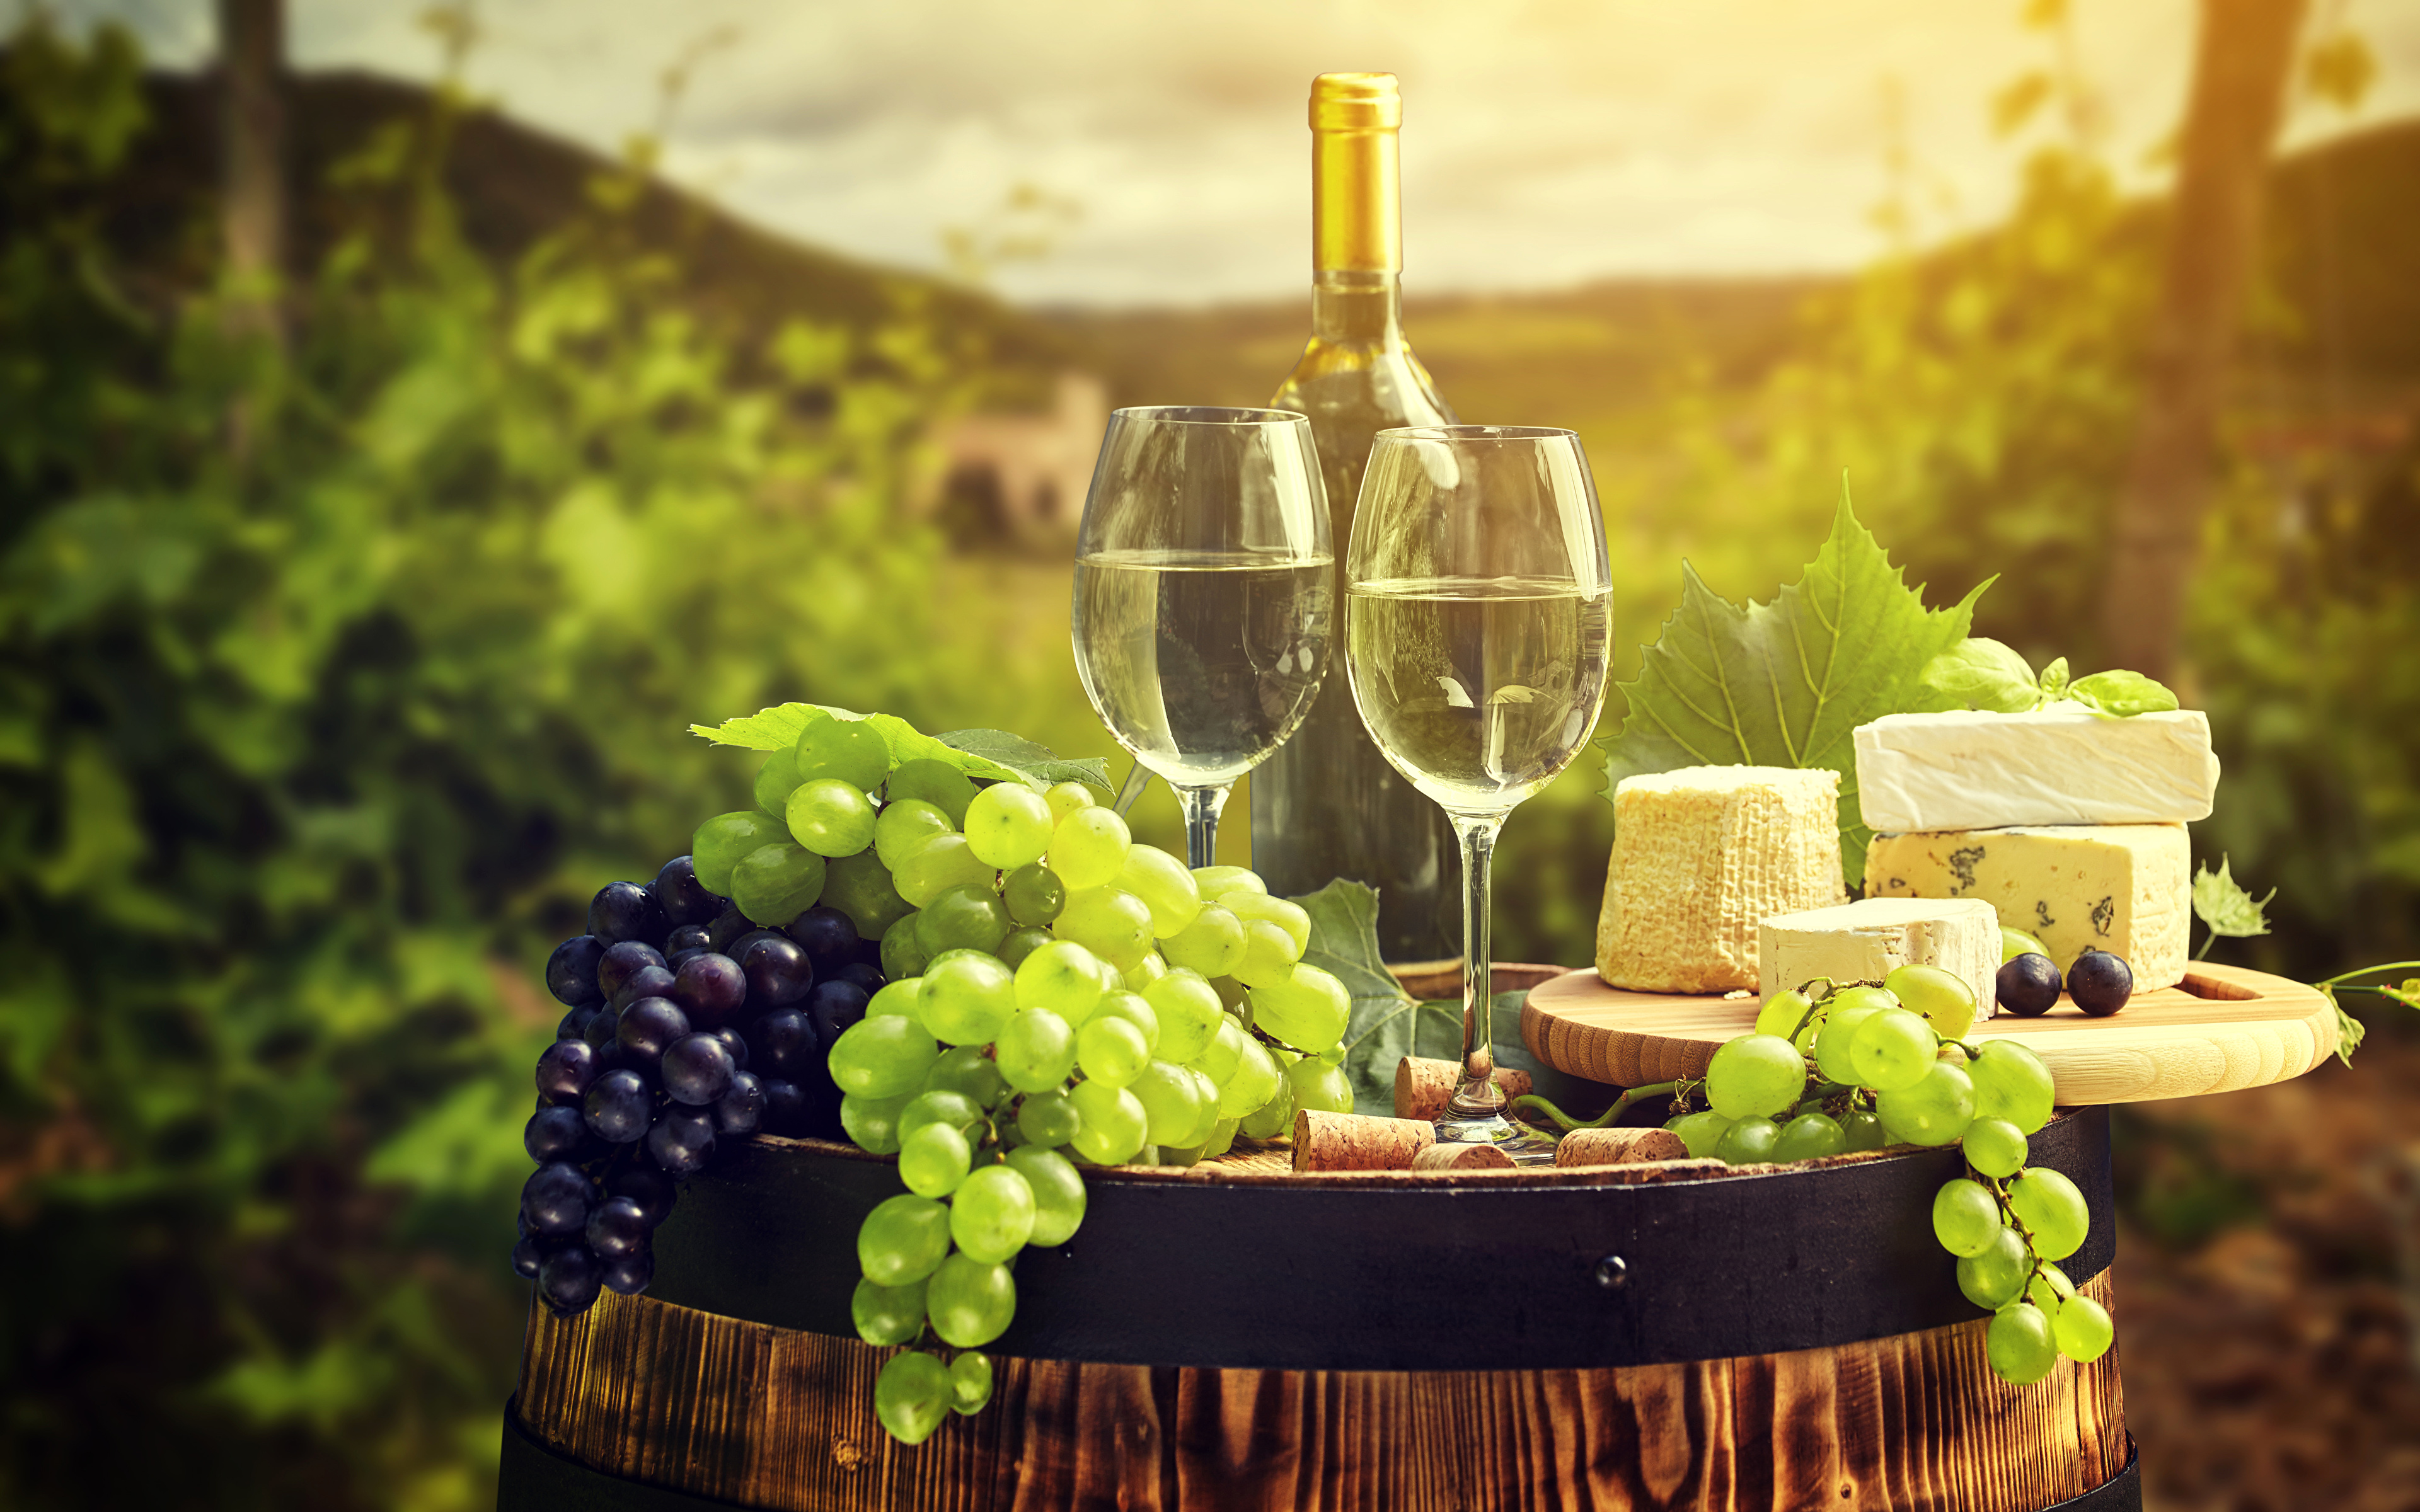 Фото Вино Сыры Виноград Еда Бокалы бутылки 3840x2400 Пища бокал Бутылка Продукты питания